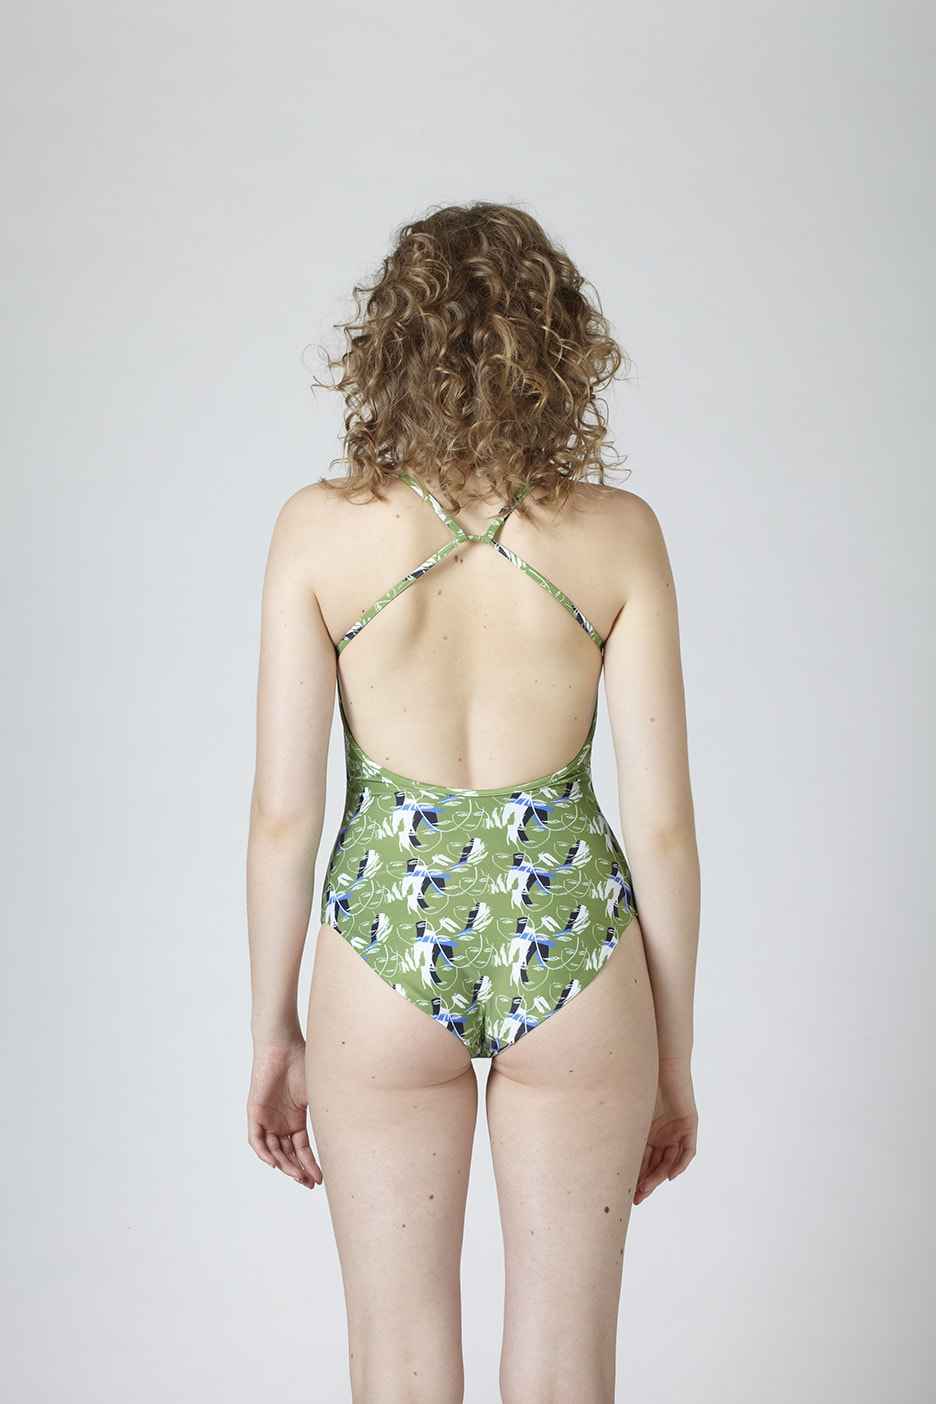 MARGARET AND HERMIONE_Swimsuit No.2_faces_hinten_EUR 197,00